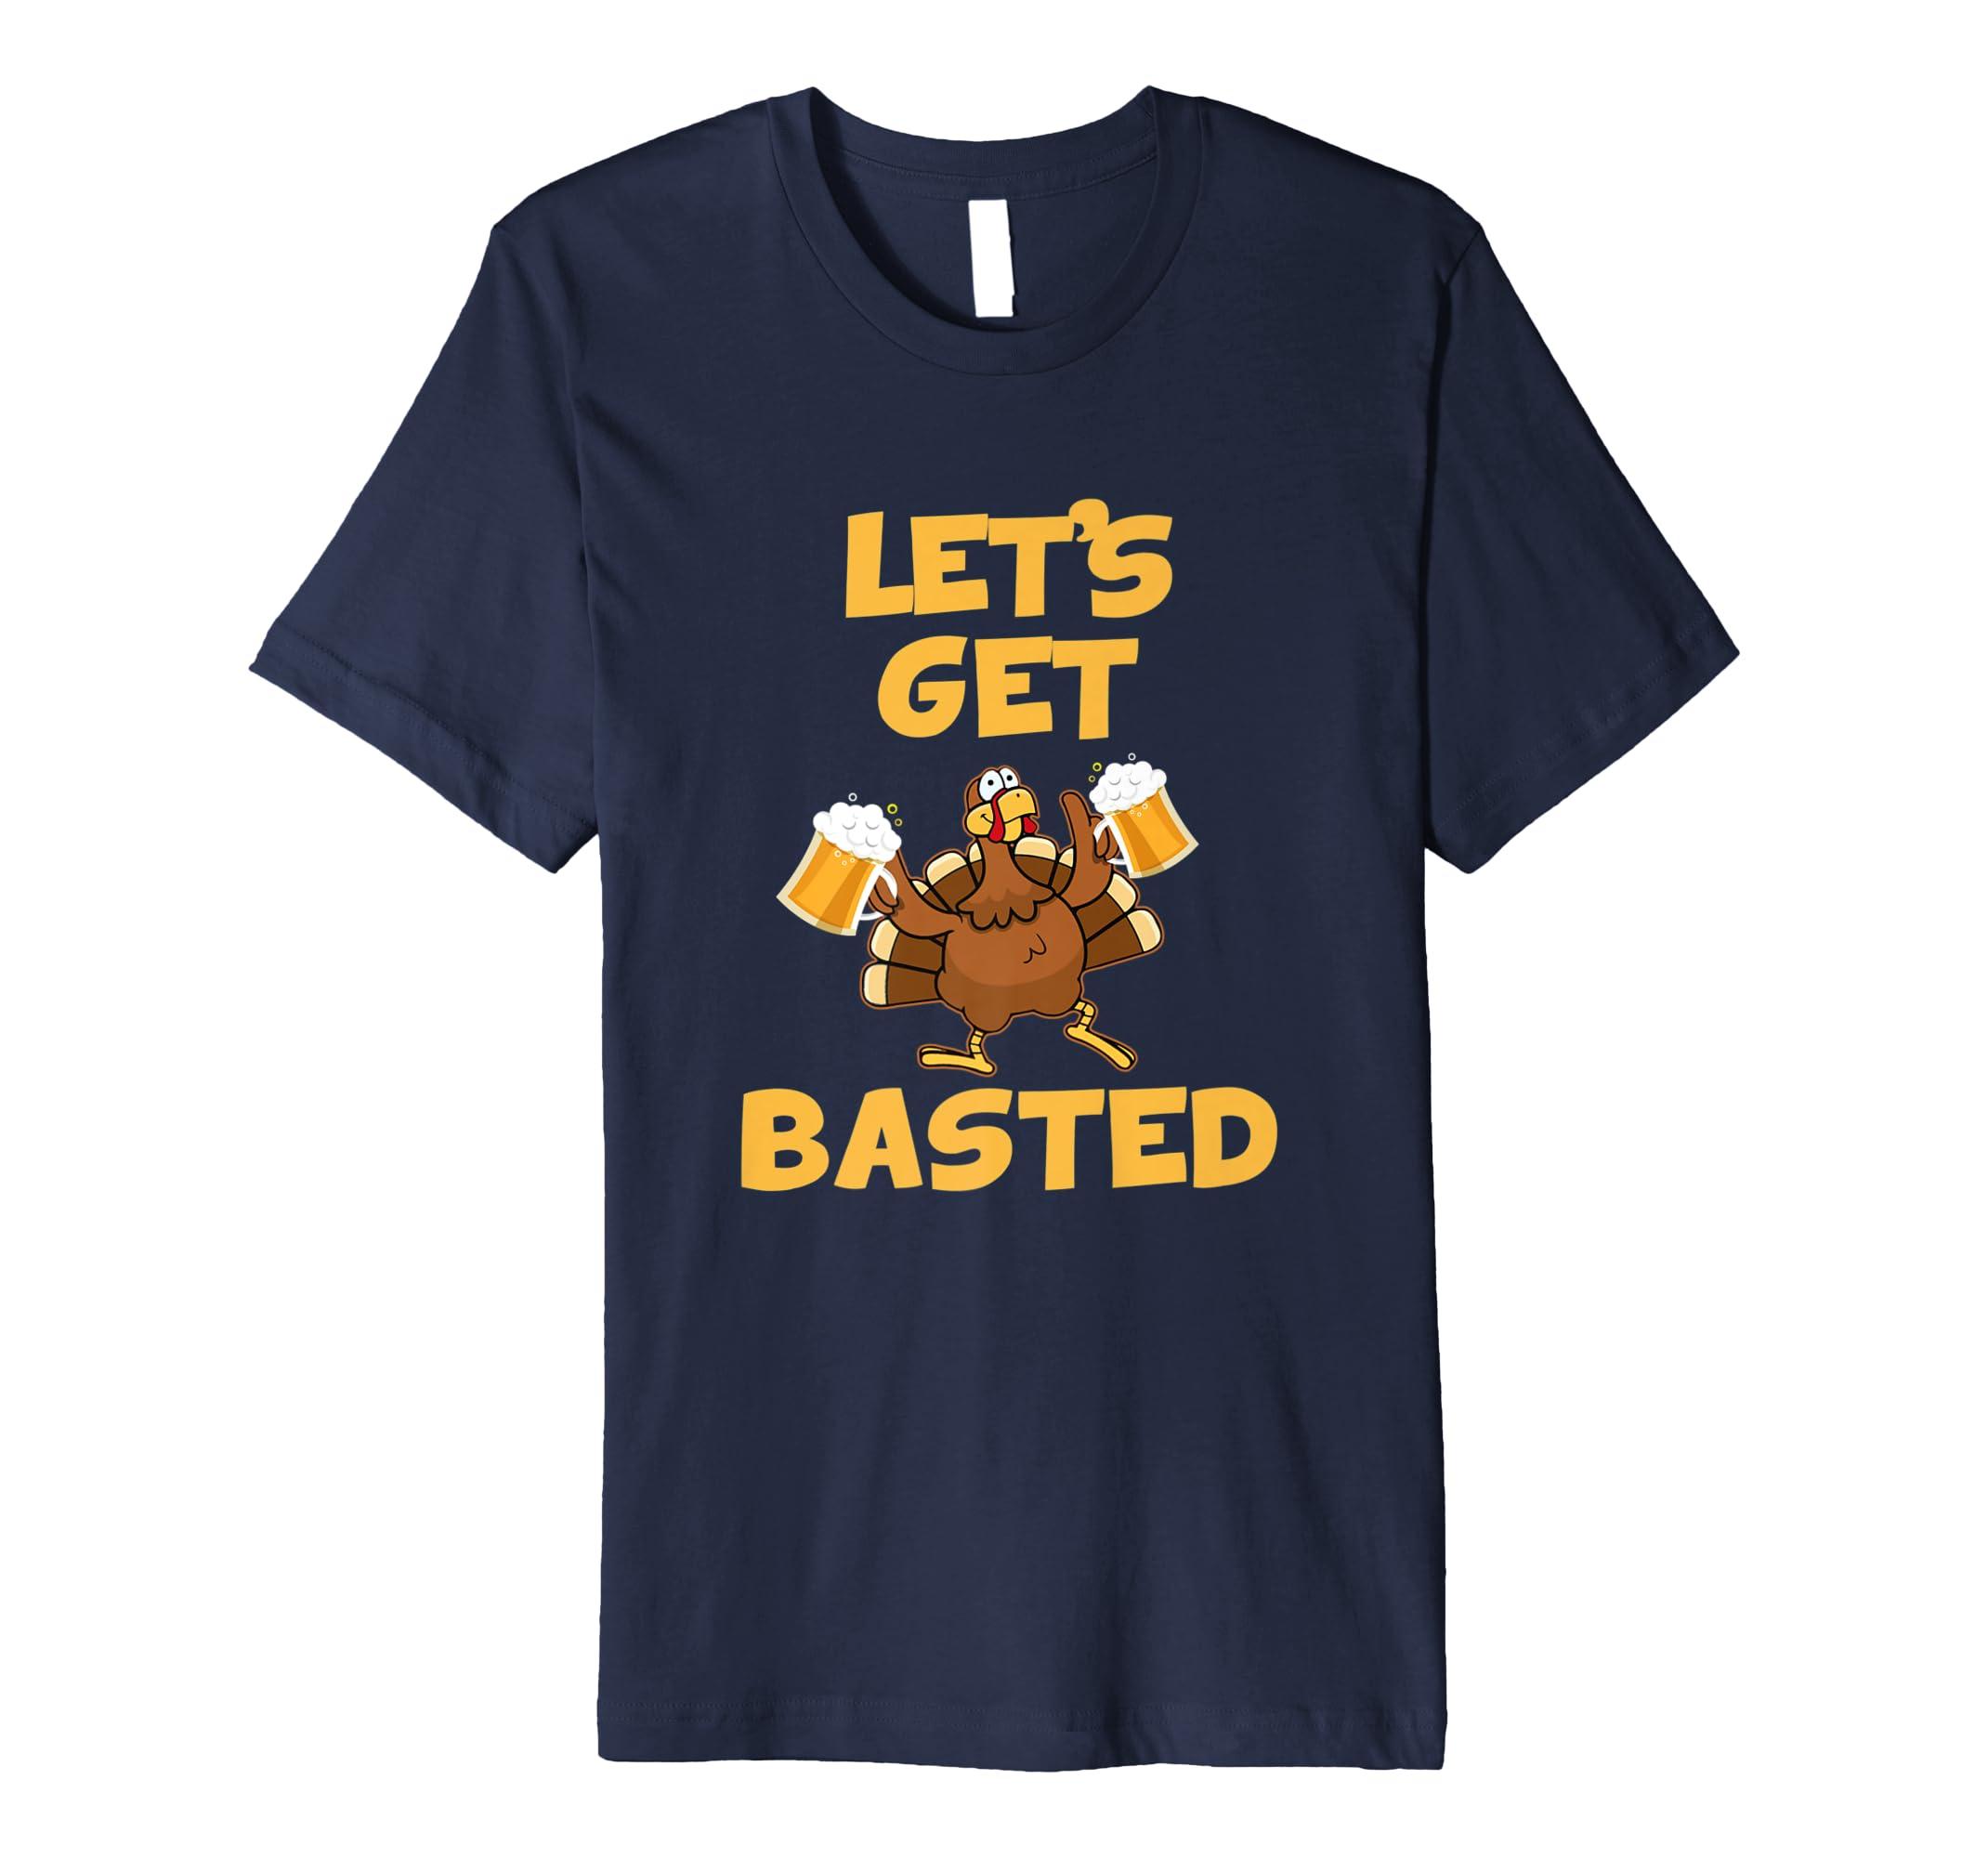 Let's Get Basted Funny Beer Turkey Thanksgiving Shirt-Teechatpro